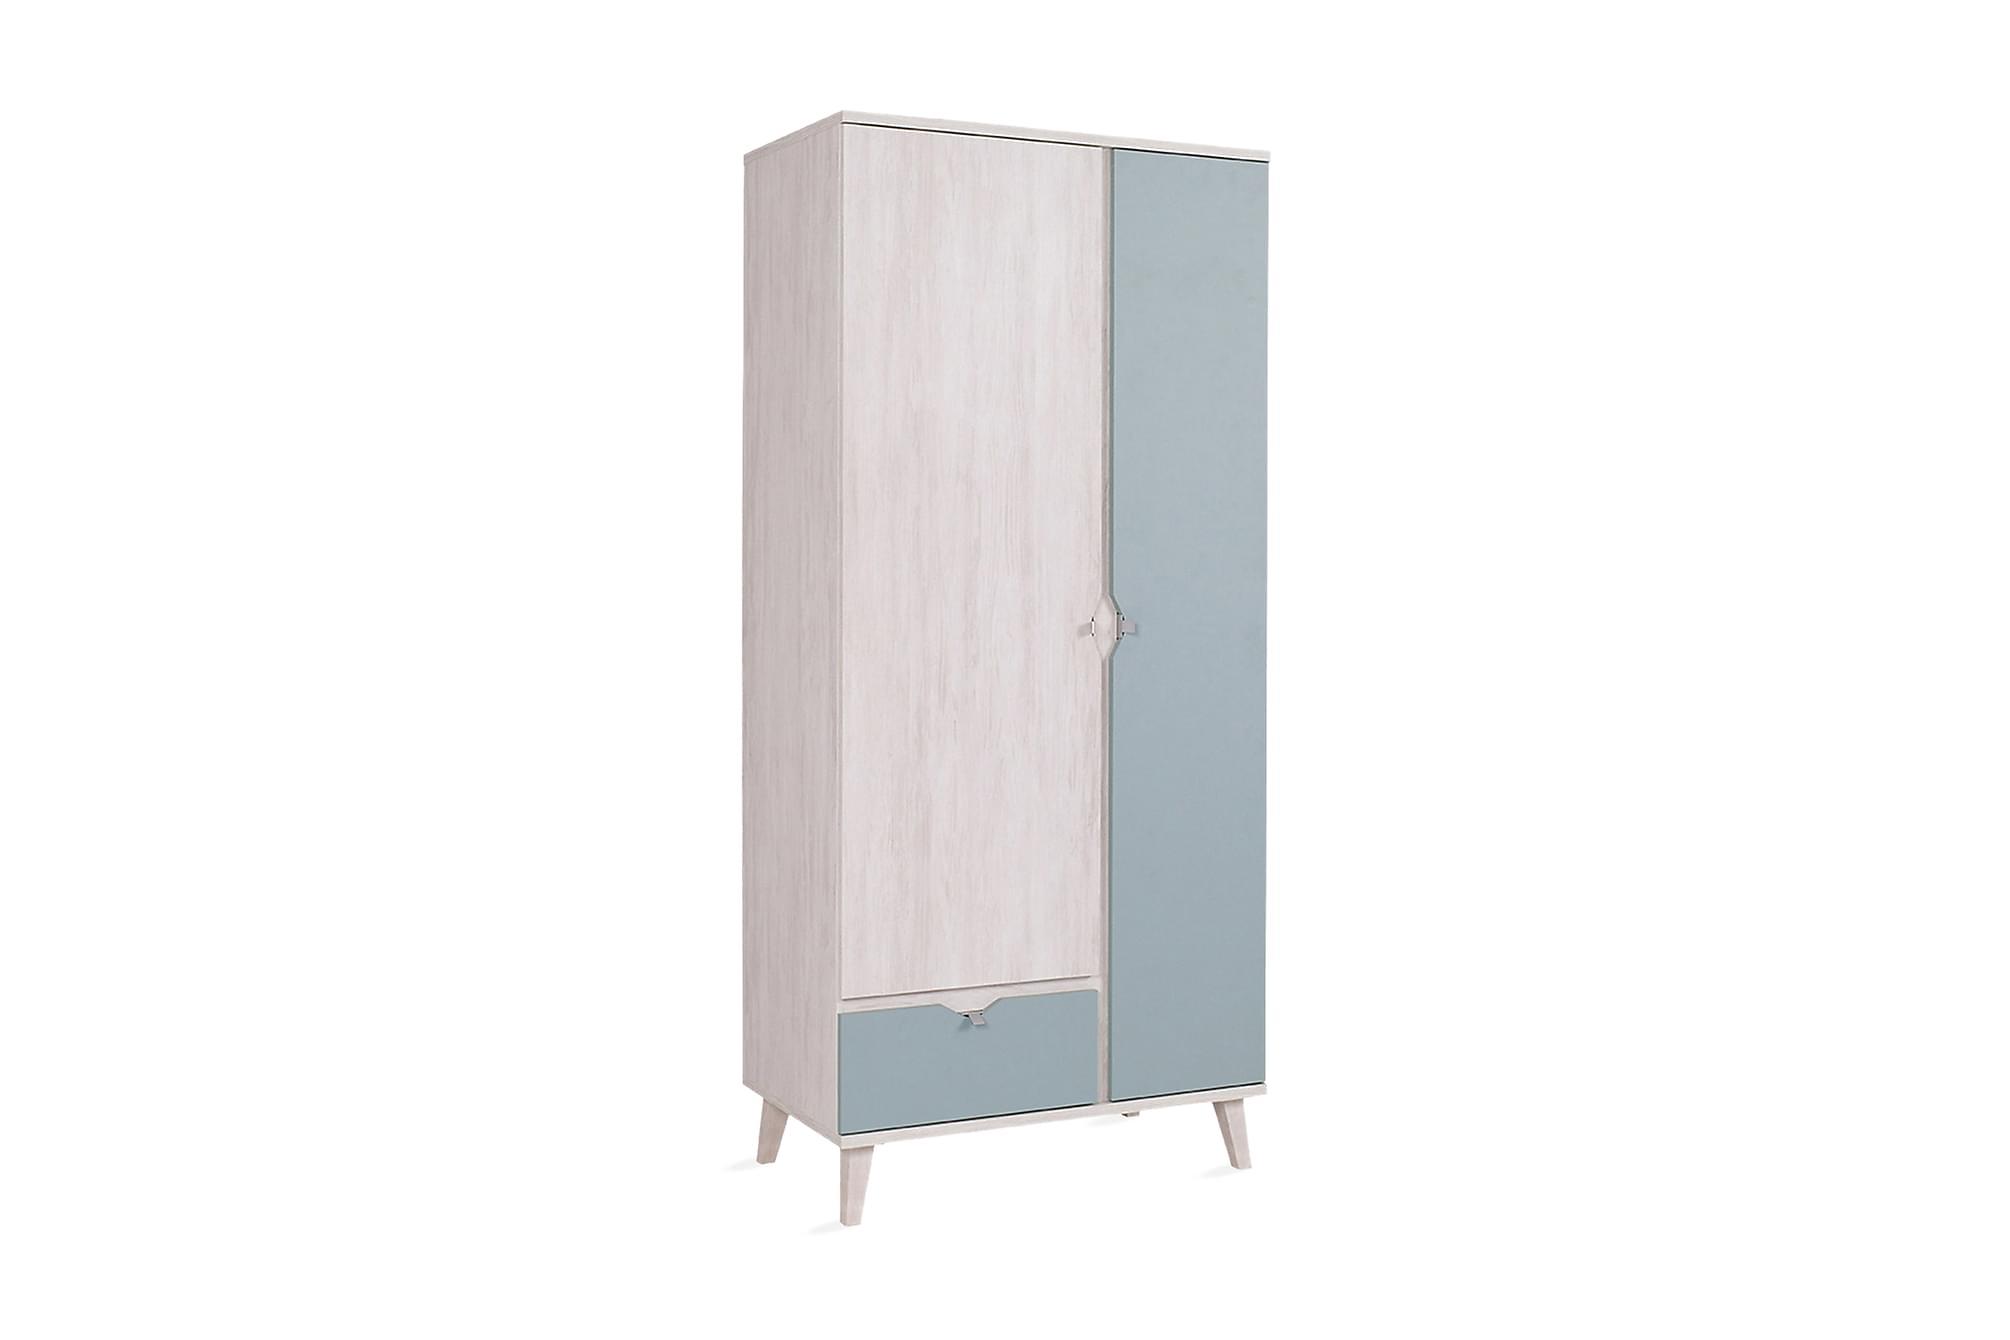 Norrhace garderob 90 vit/blå